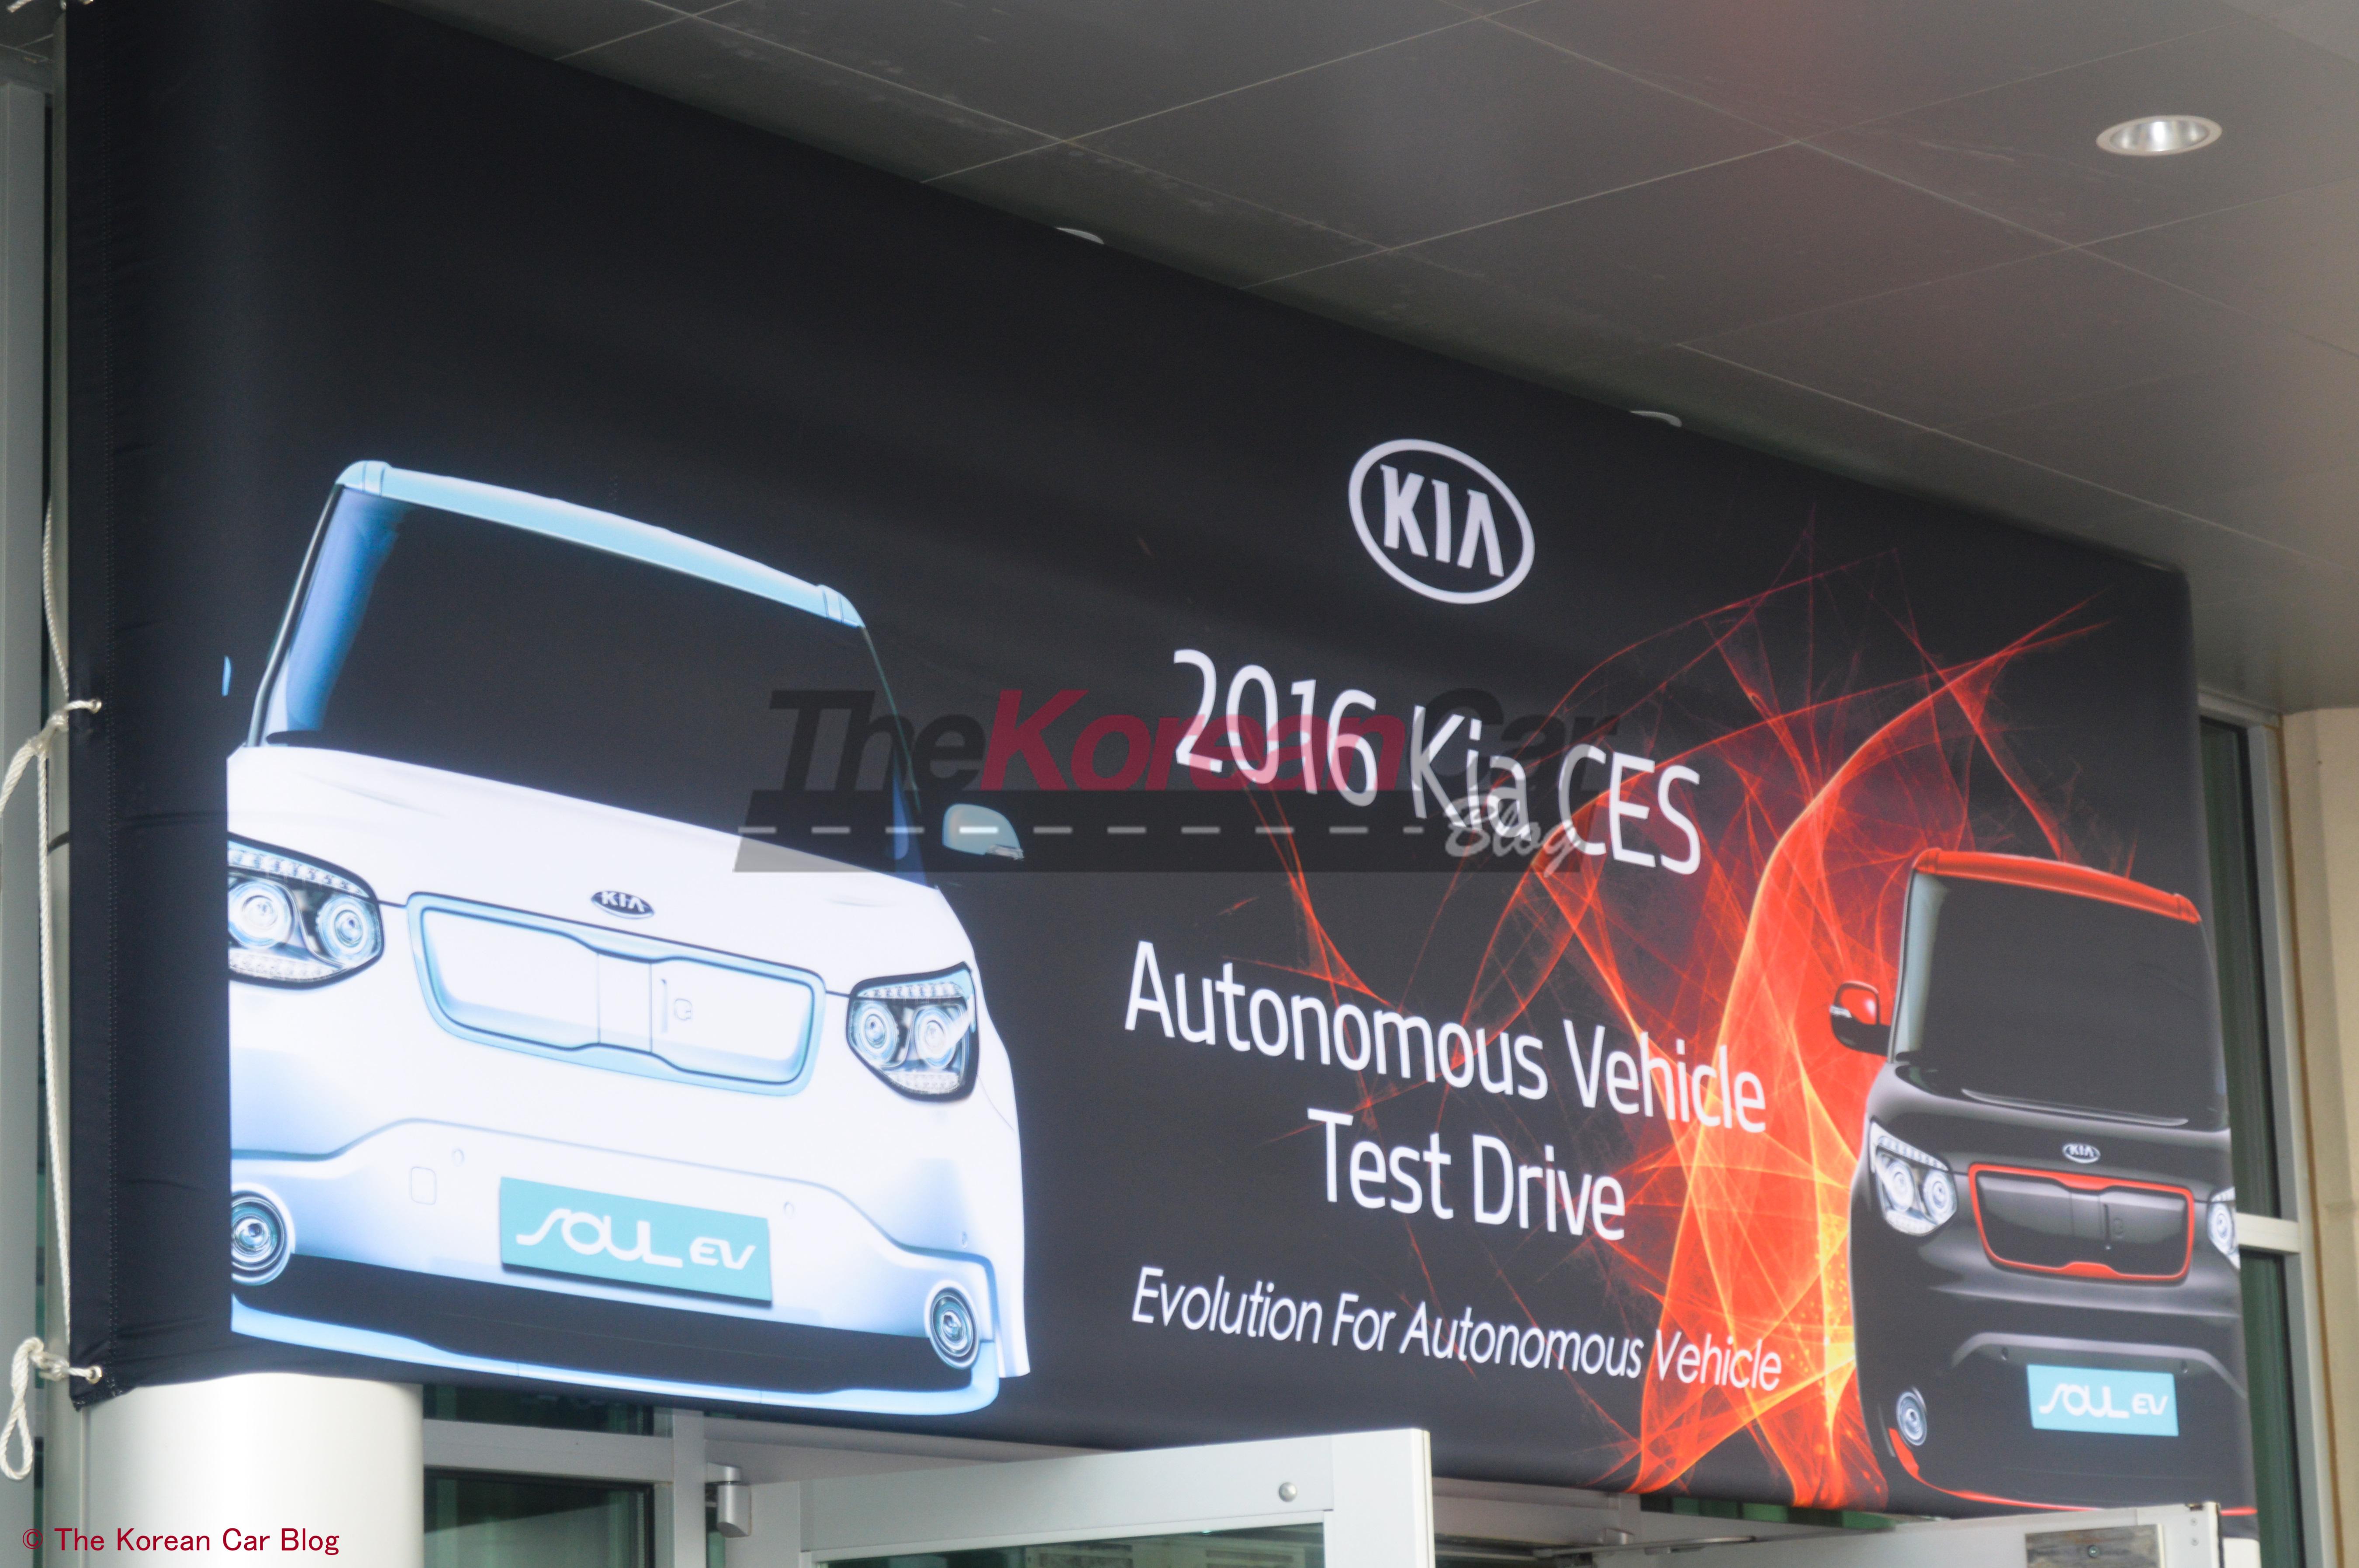 Kia at the 2016 CES